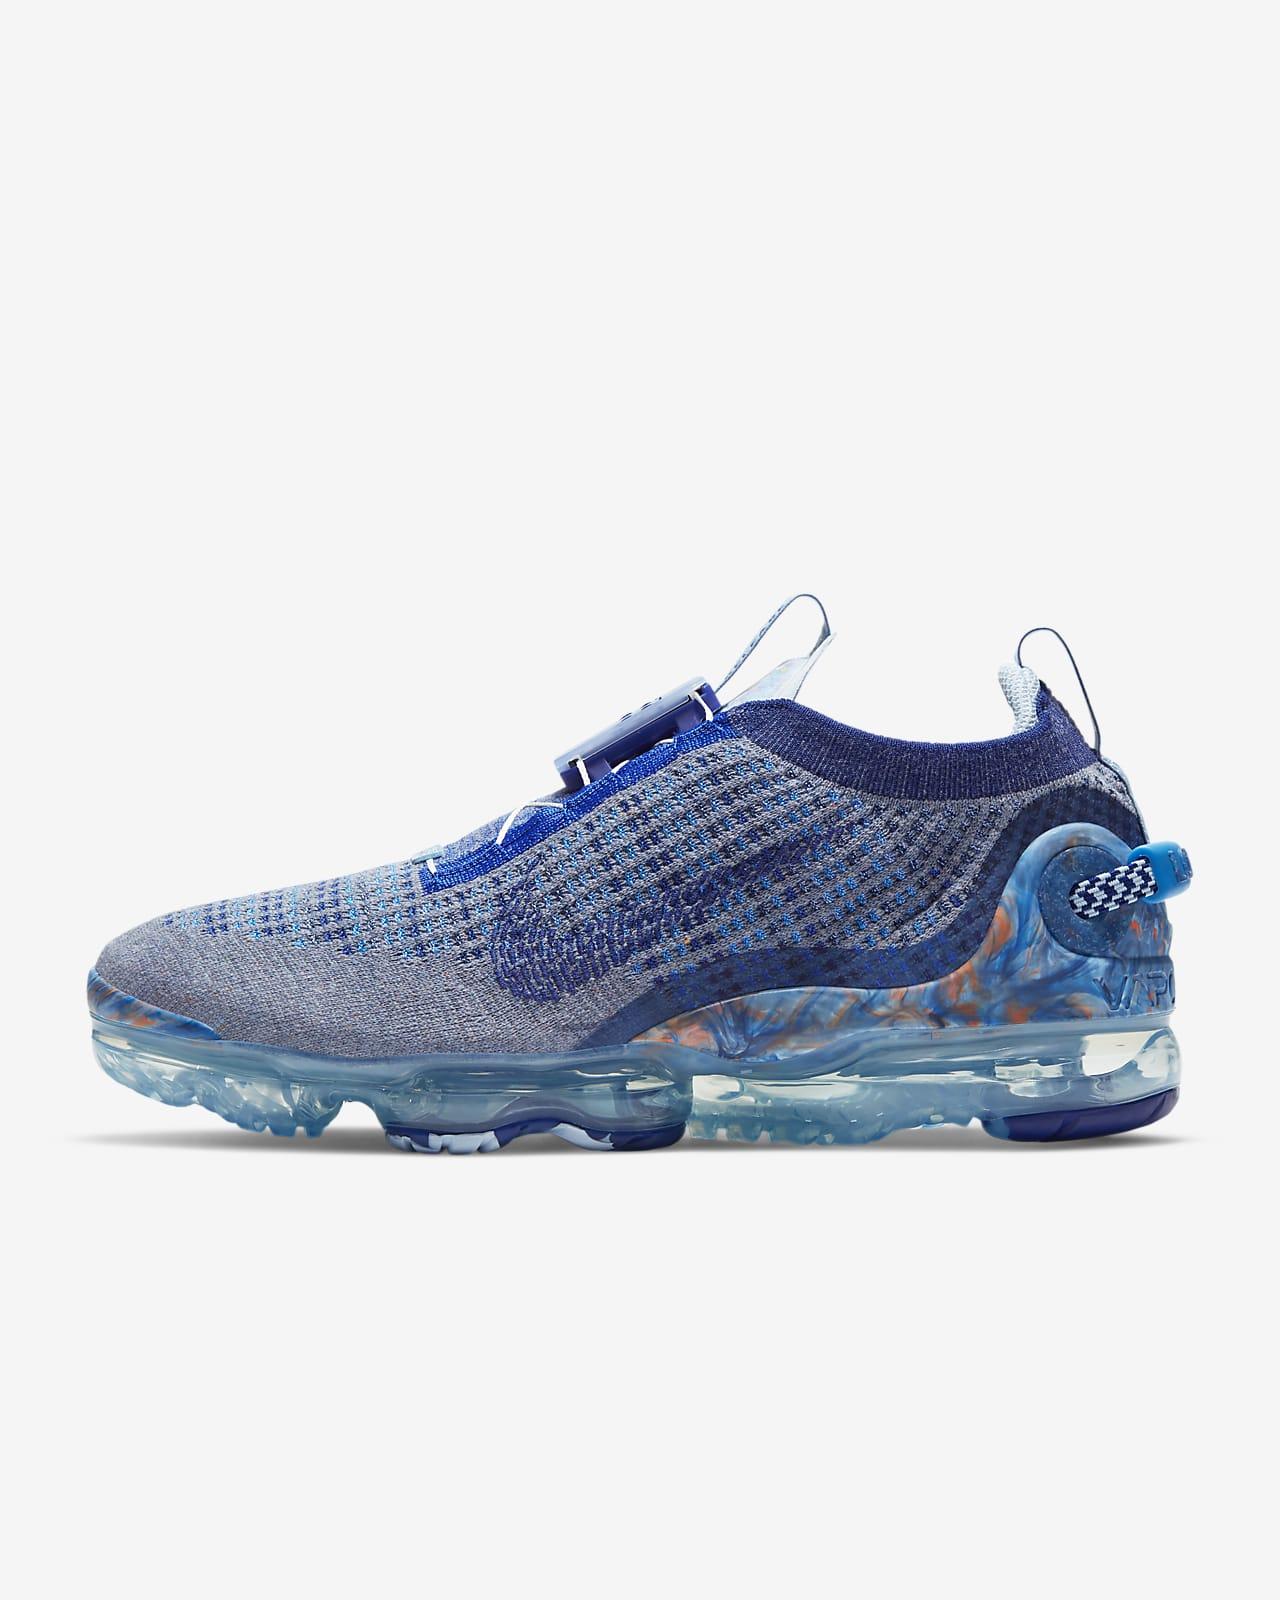 men's nike air vapormax shoes